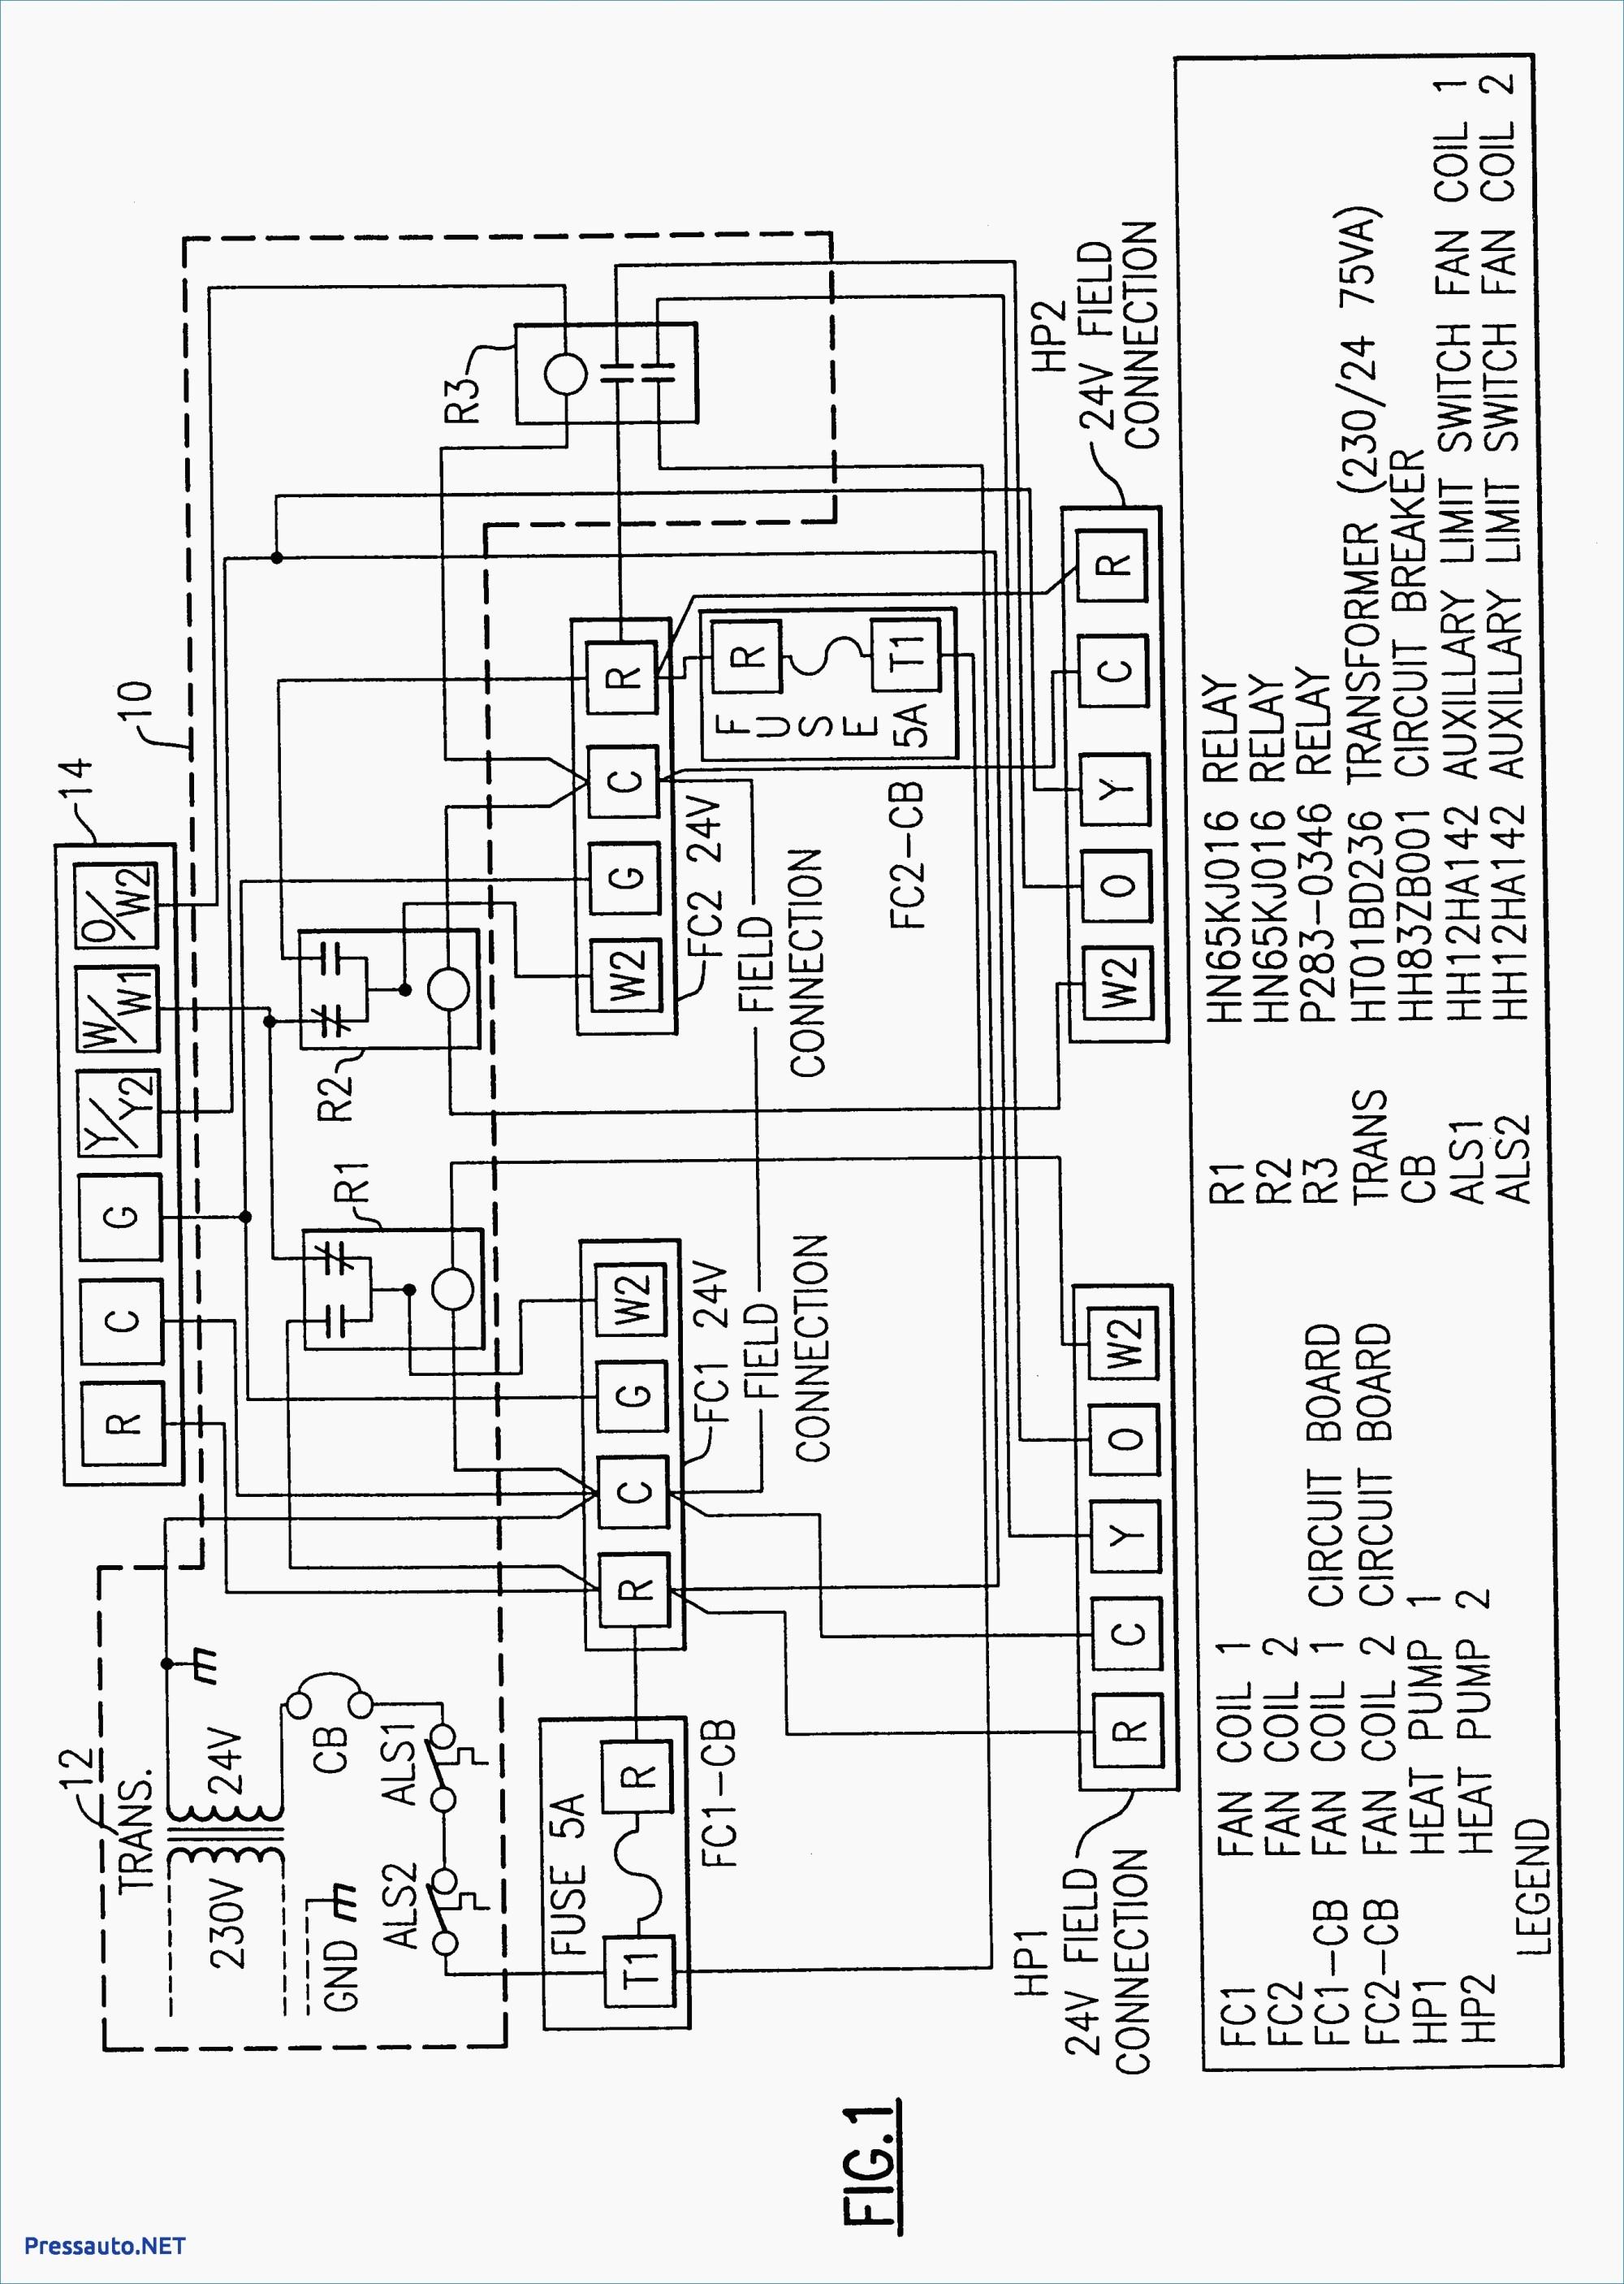 hight resolution of fujitsu mini split heat pump wiring diagram air source heat pump wiring diagram wellread me